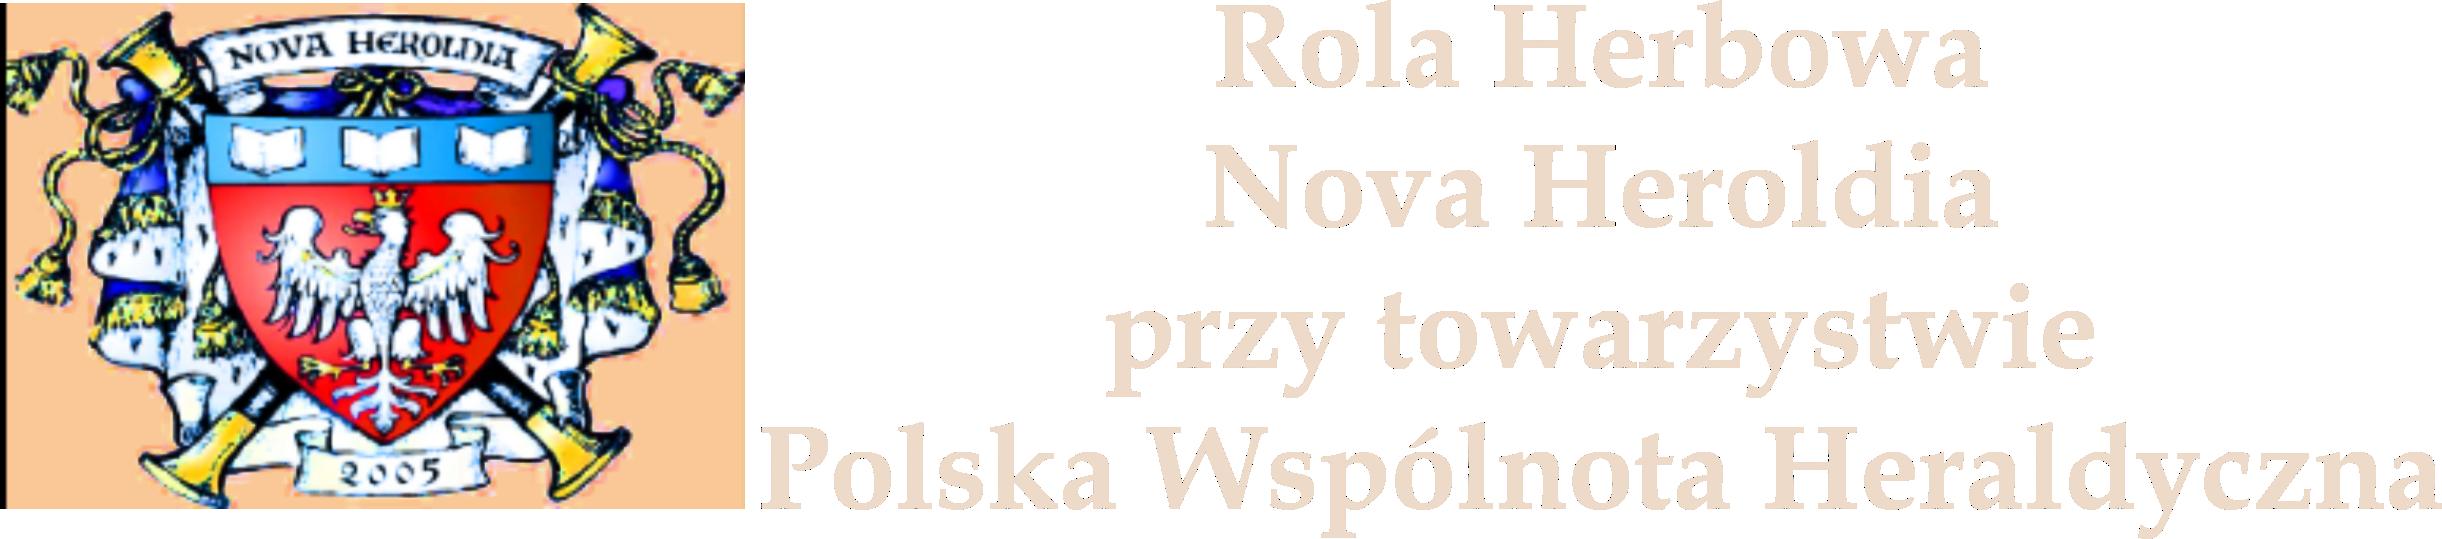 Nova Heraldia